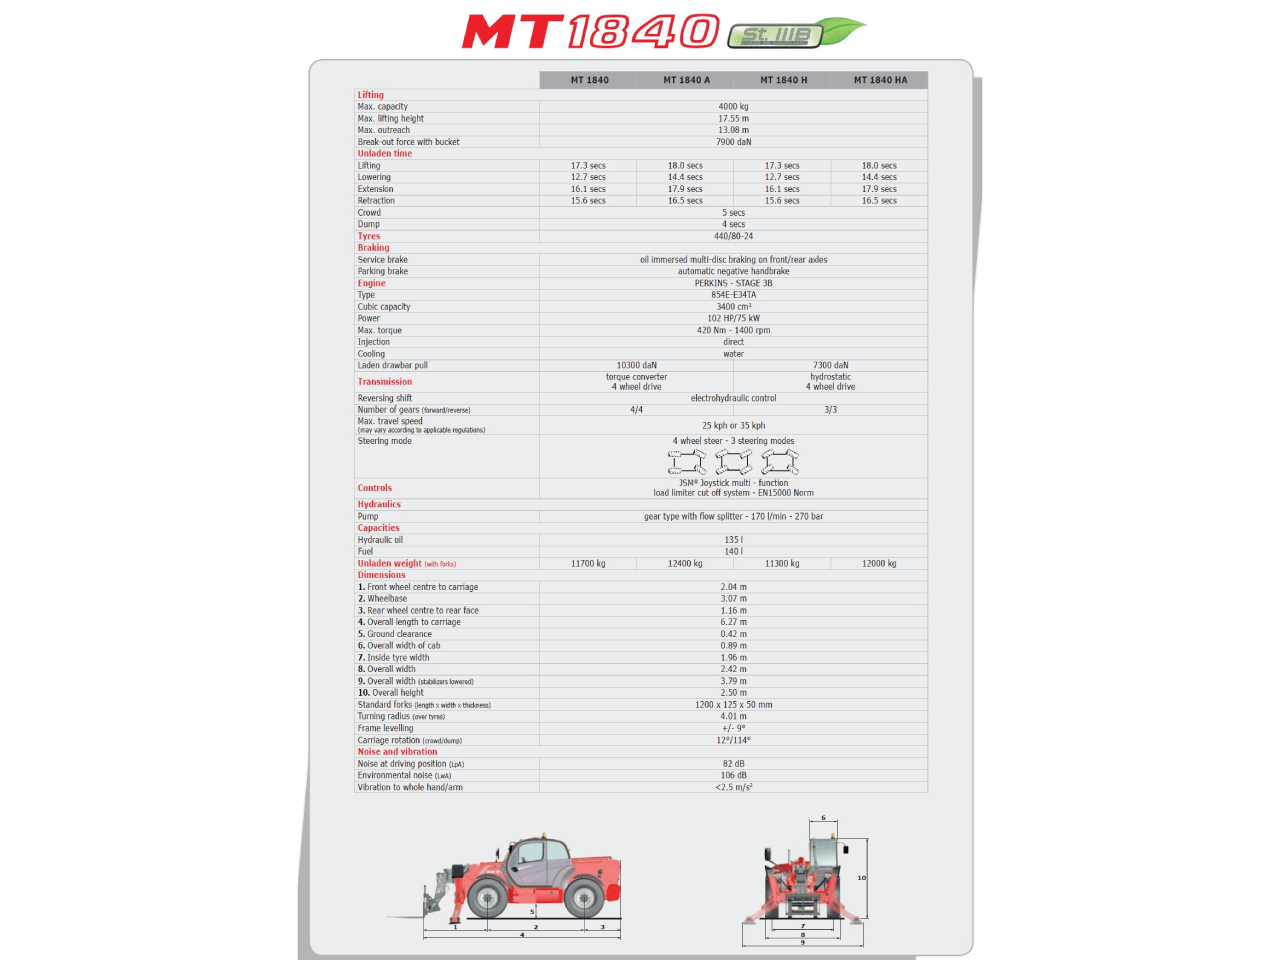 Manitou-MT1840-Telehandler-Specs